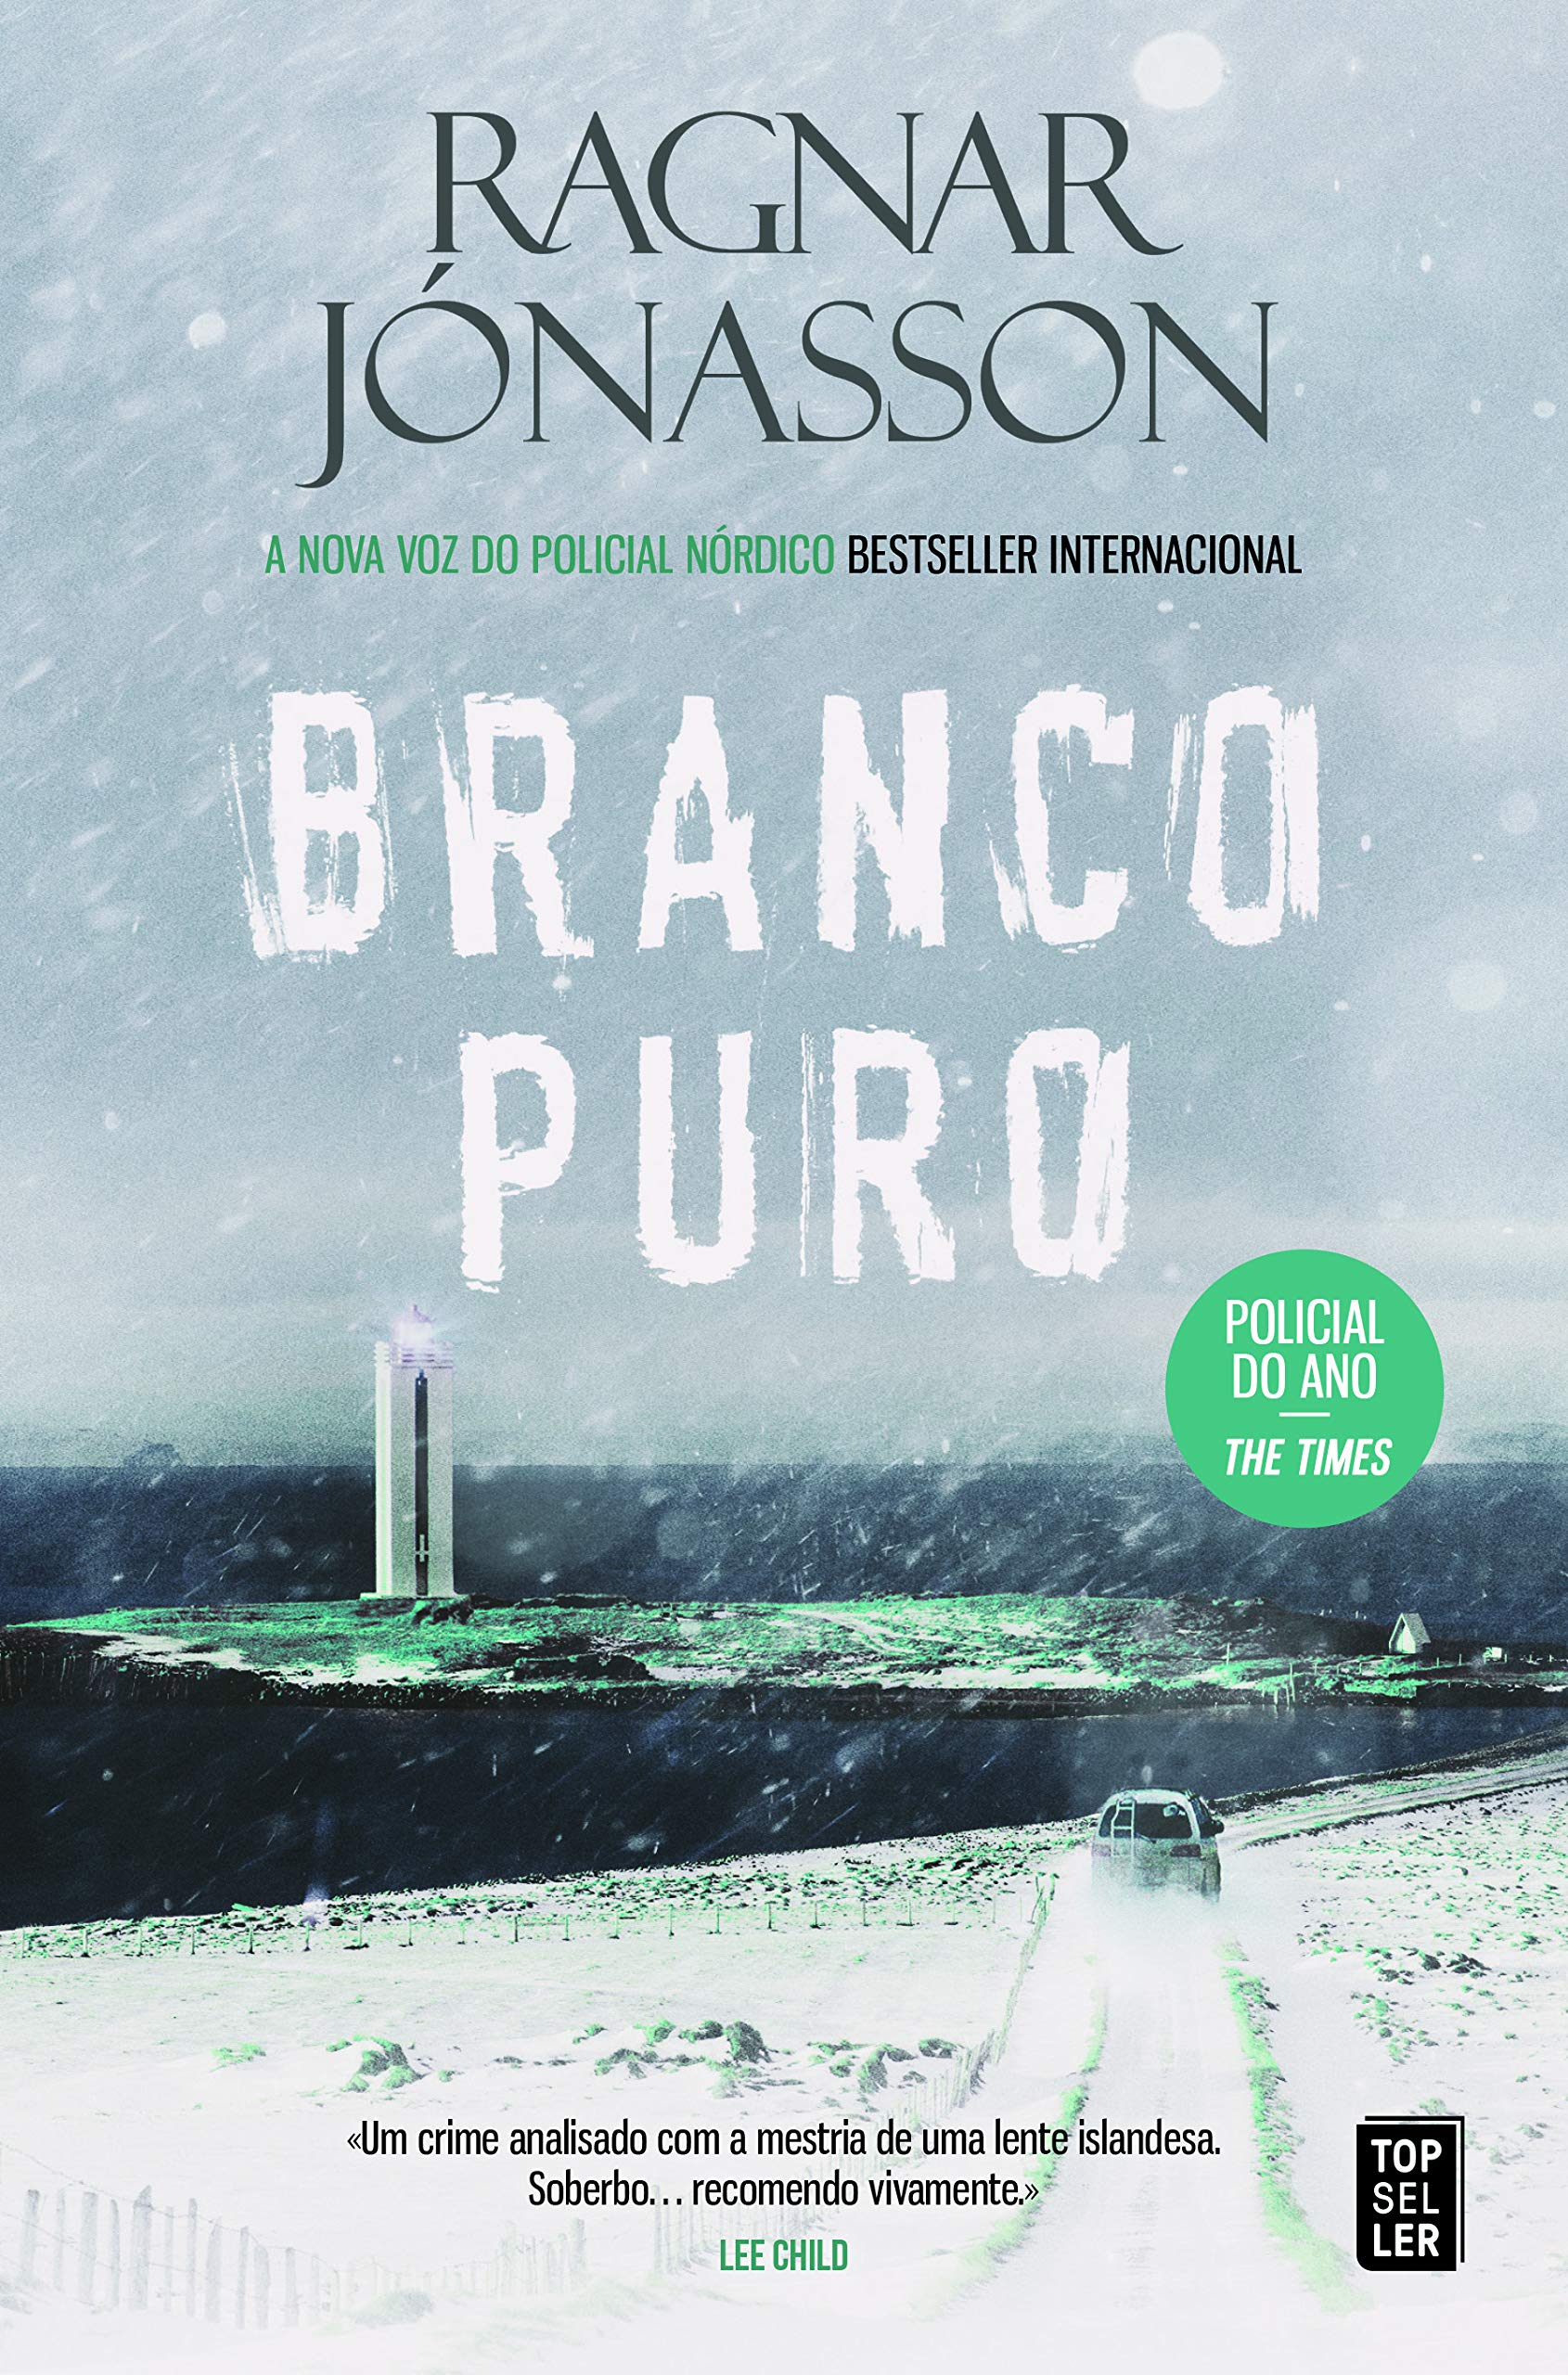 Branco Puro by Ragnar Jónasson